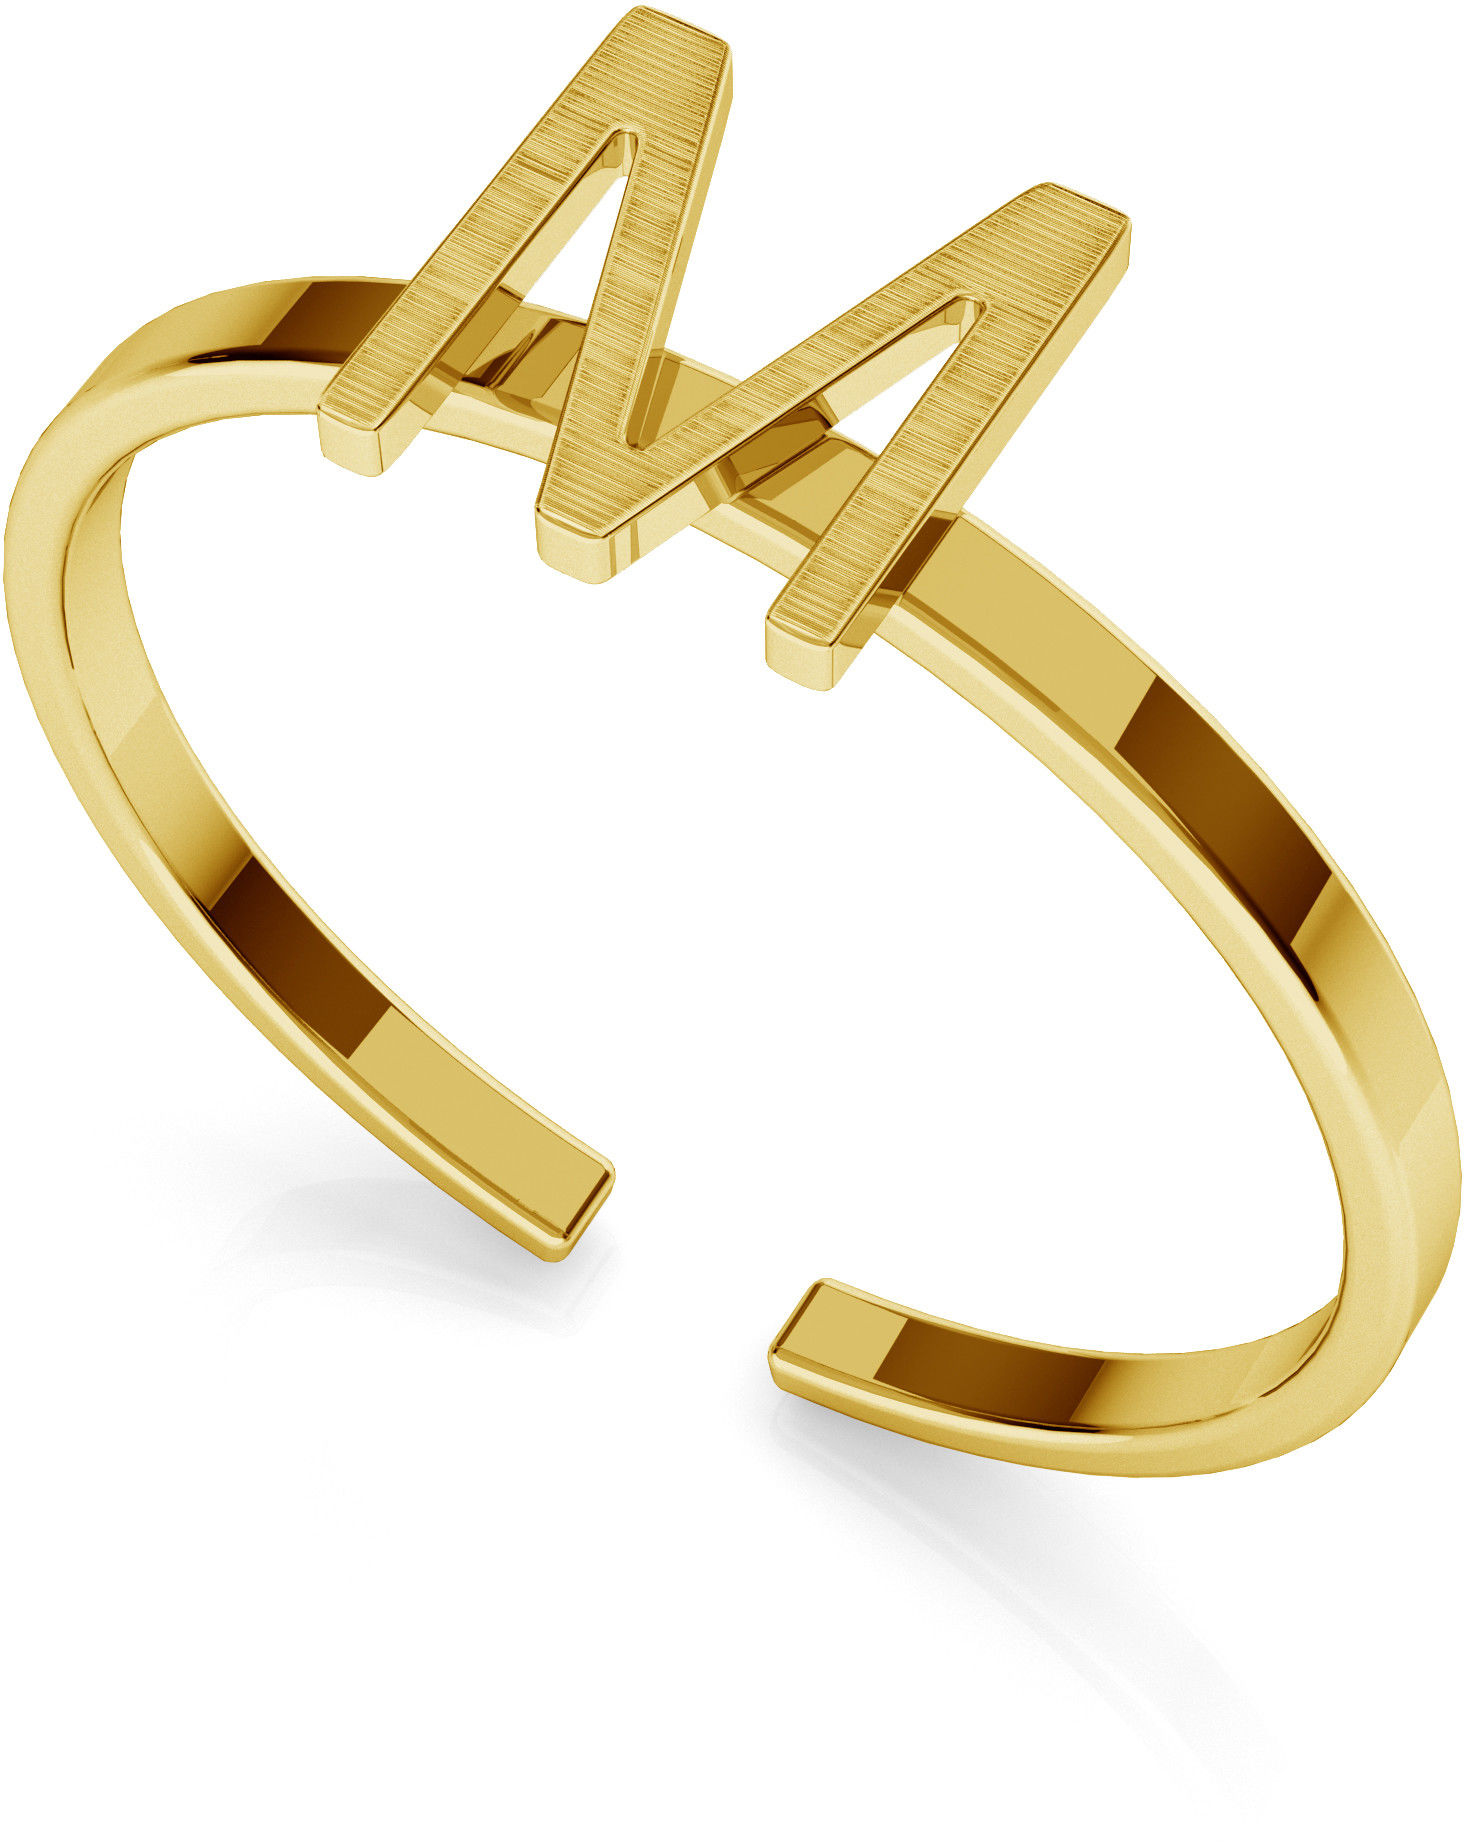 Srebrny pierścionek z literką My RING, srebro 925 : Litera - O, Srebro - kolor pokrycia - Pokrycie żółtym 18K złotem